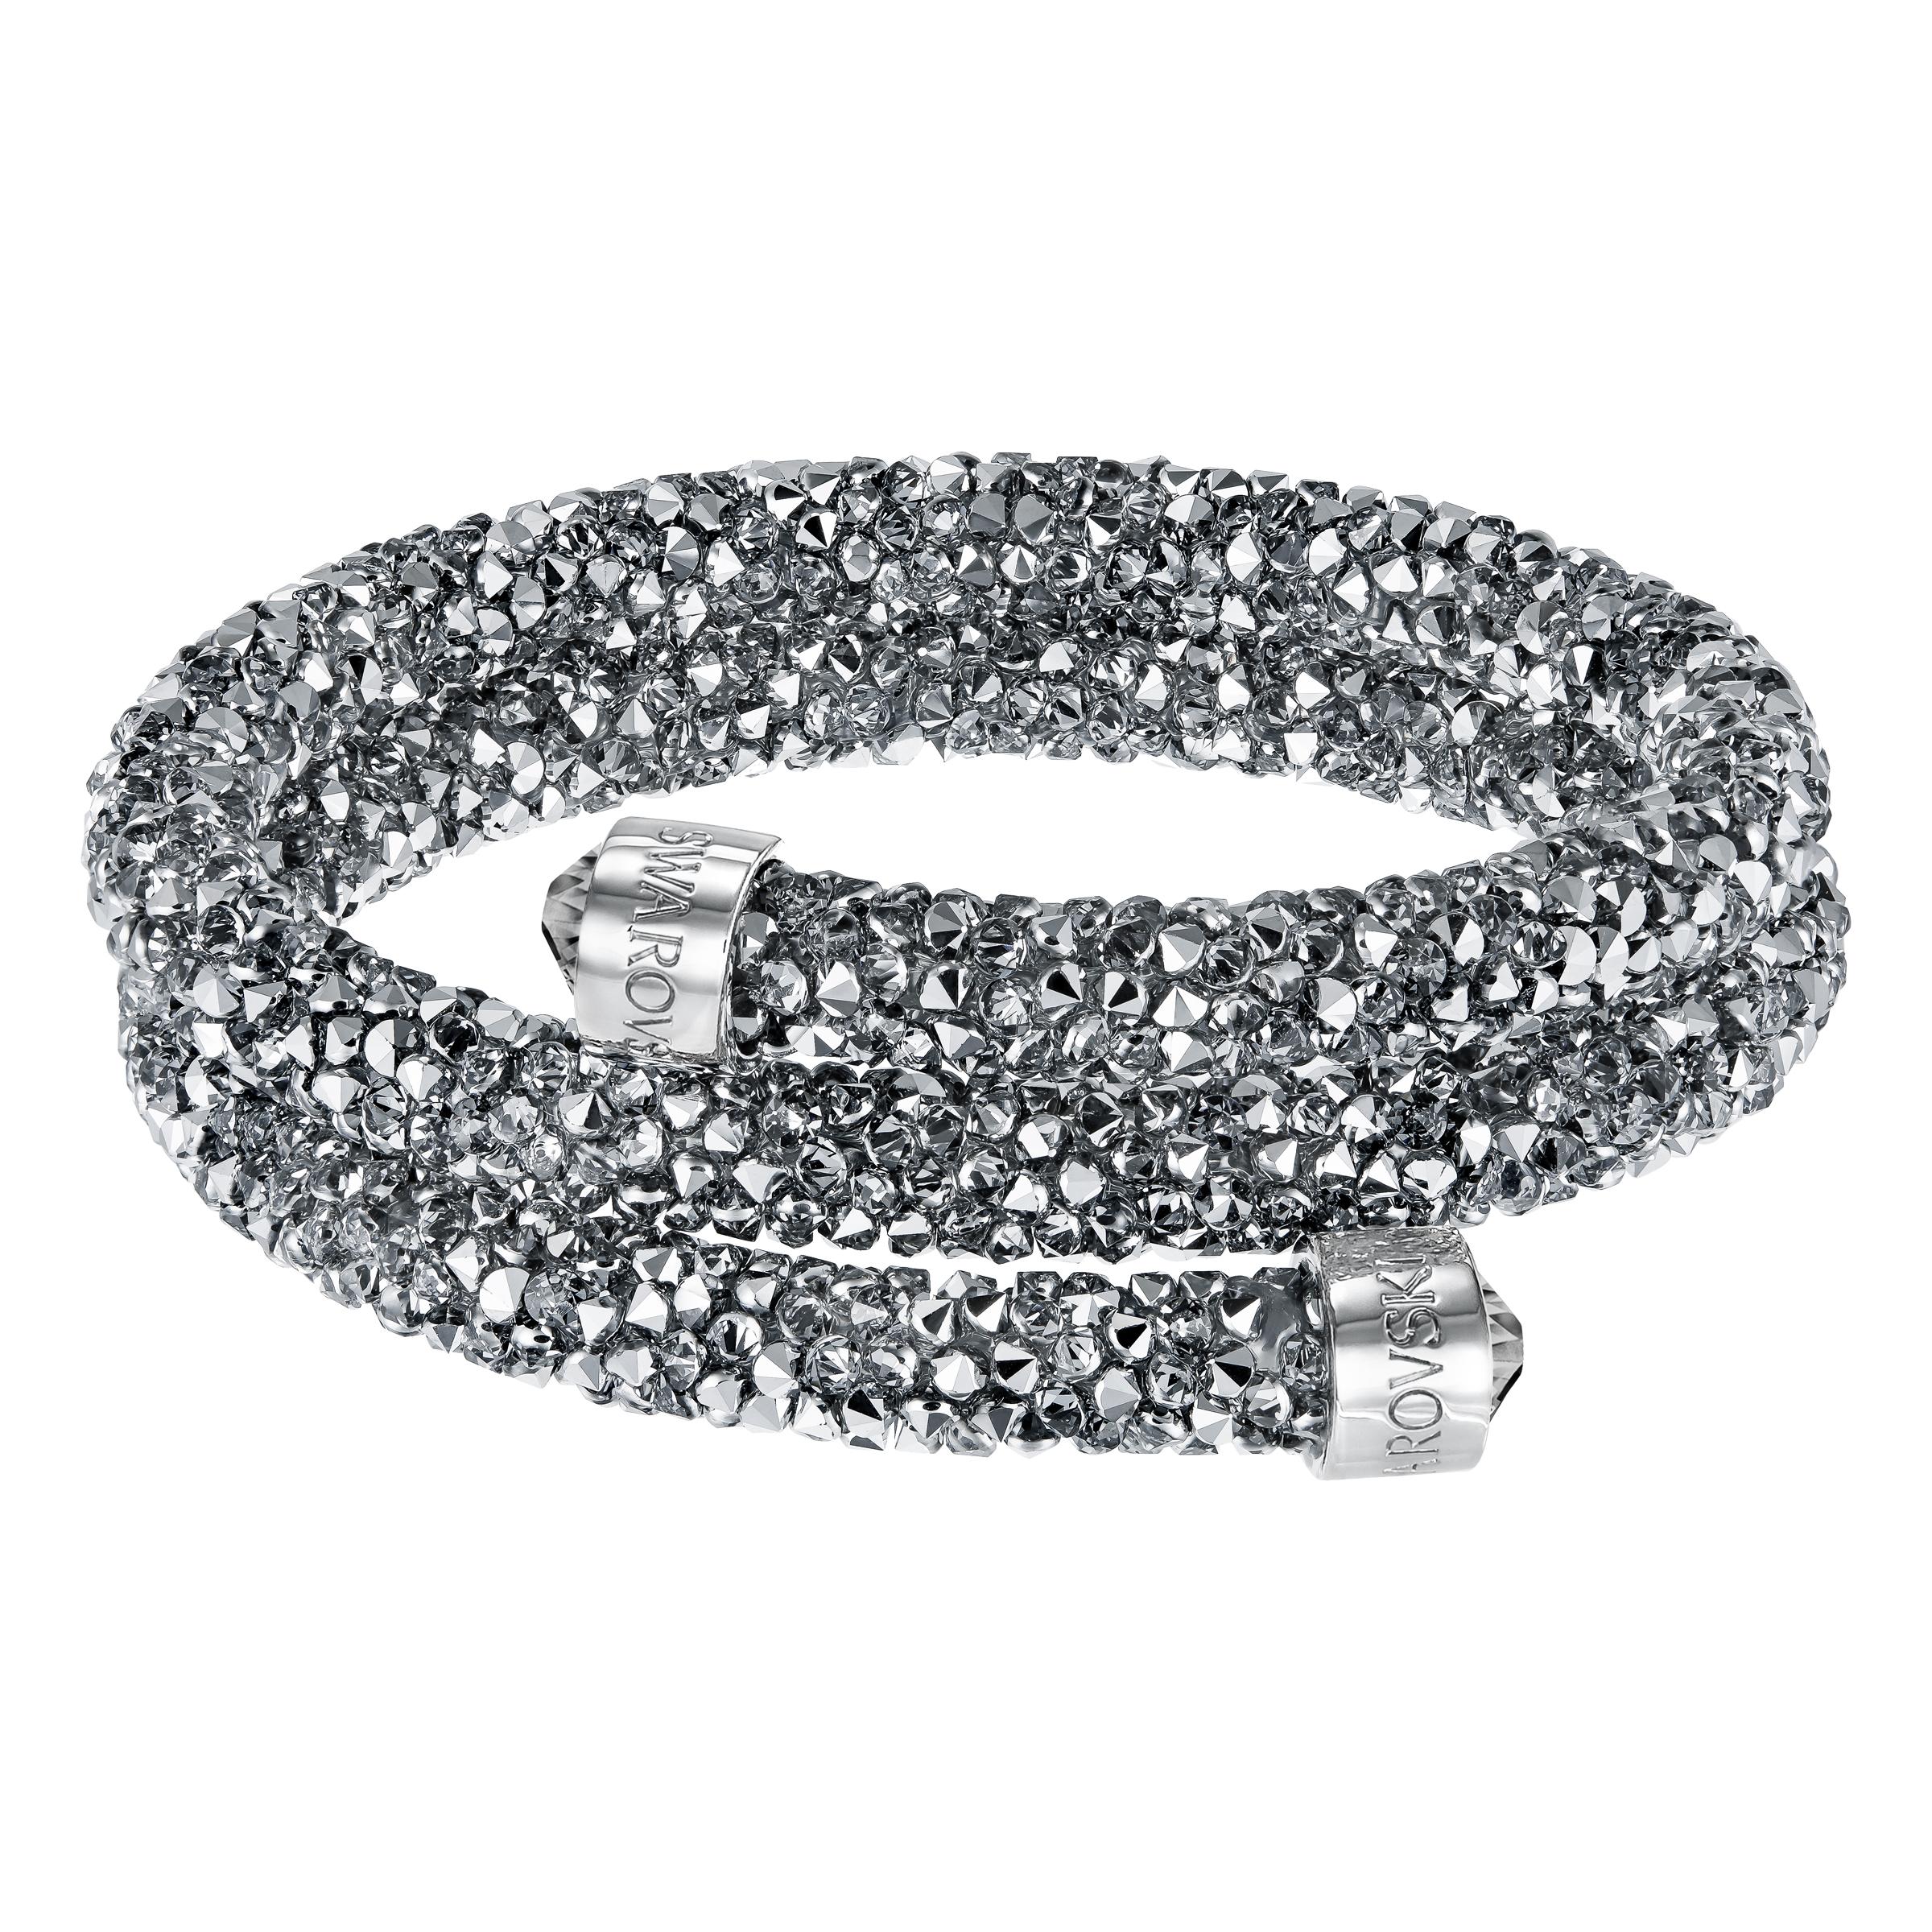 Bracelet-jonc Swarovski double Crystaldust, gris, acier inoxydable